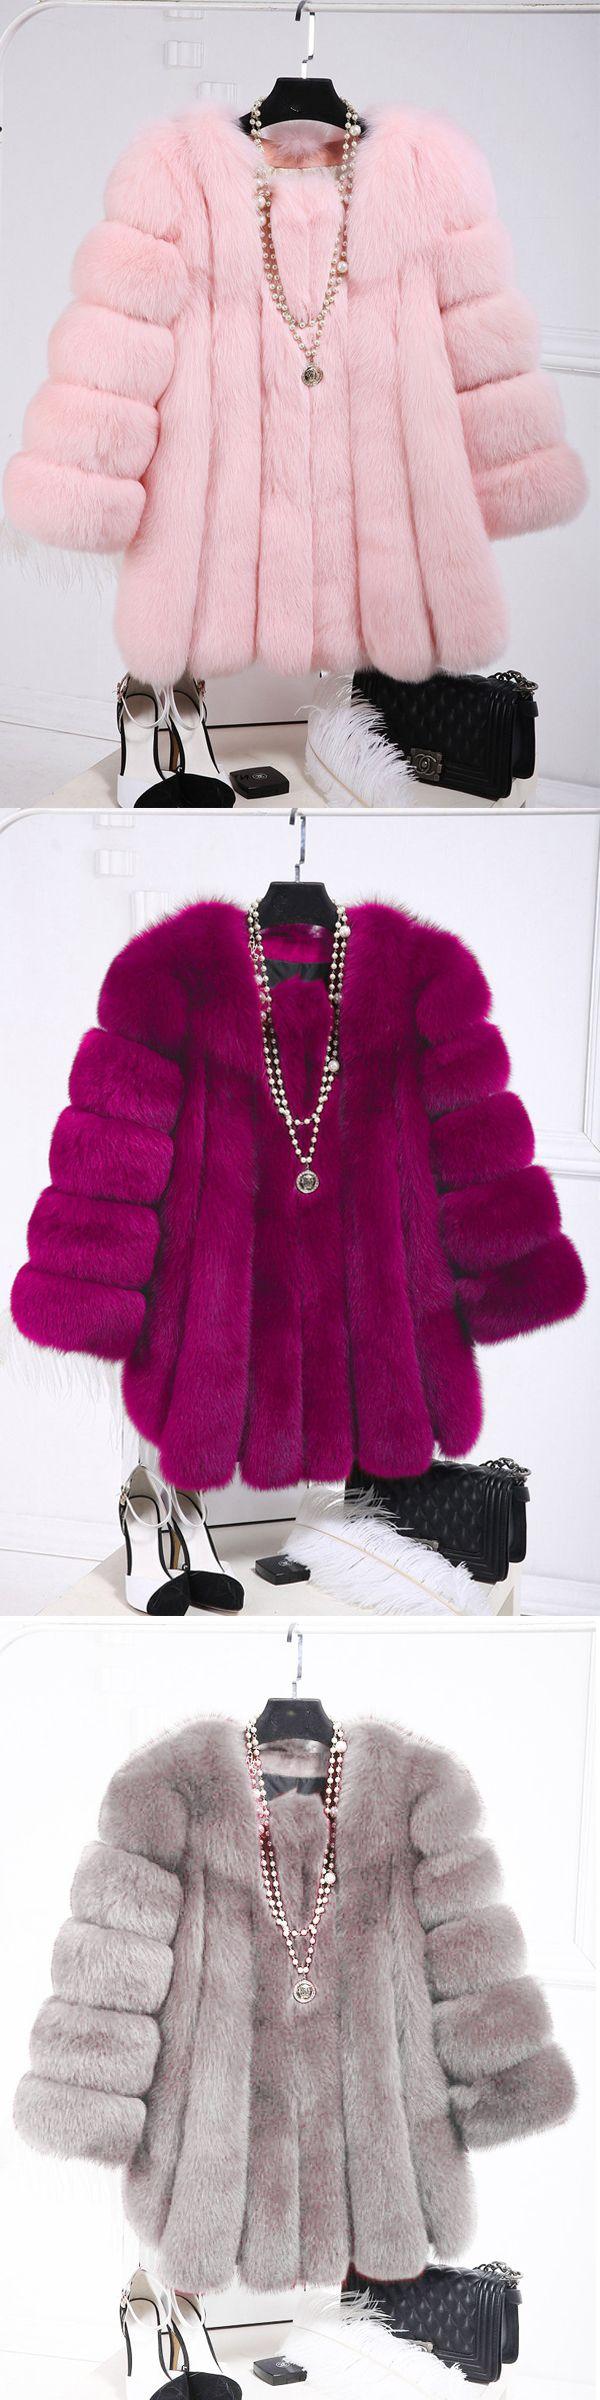 [Newchic Online Shopping] 46%OFF Casual Faux Fur Coats for Women 2